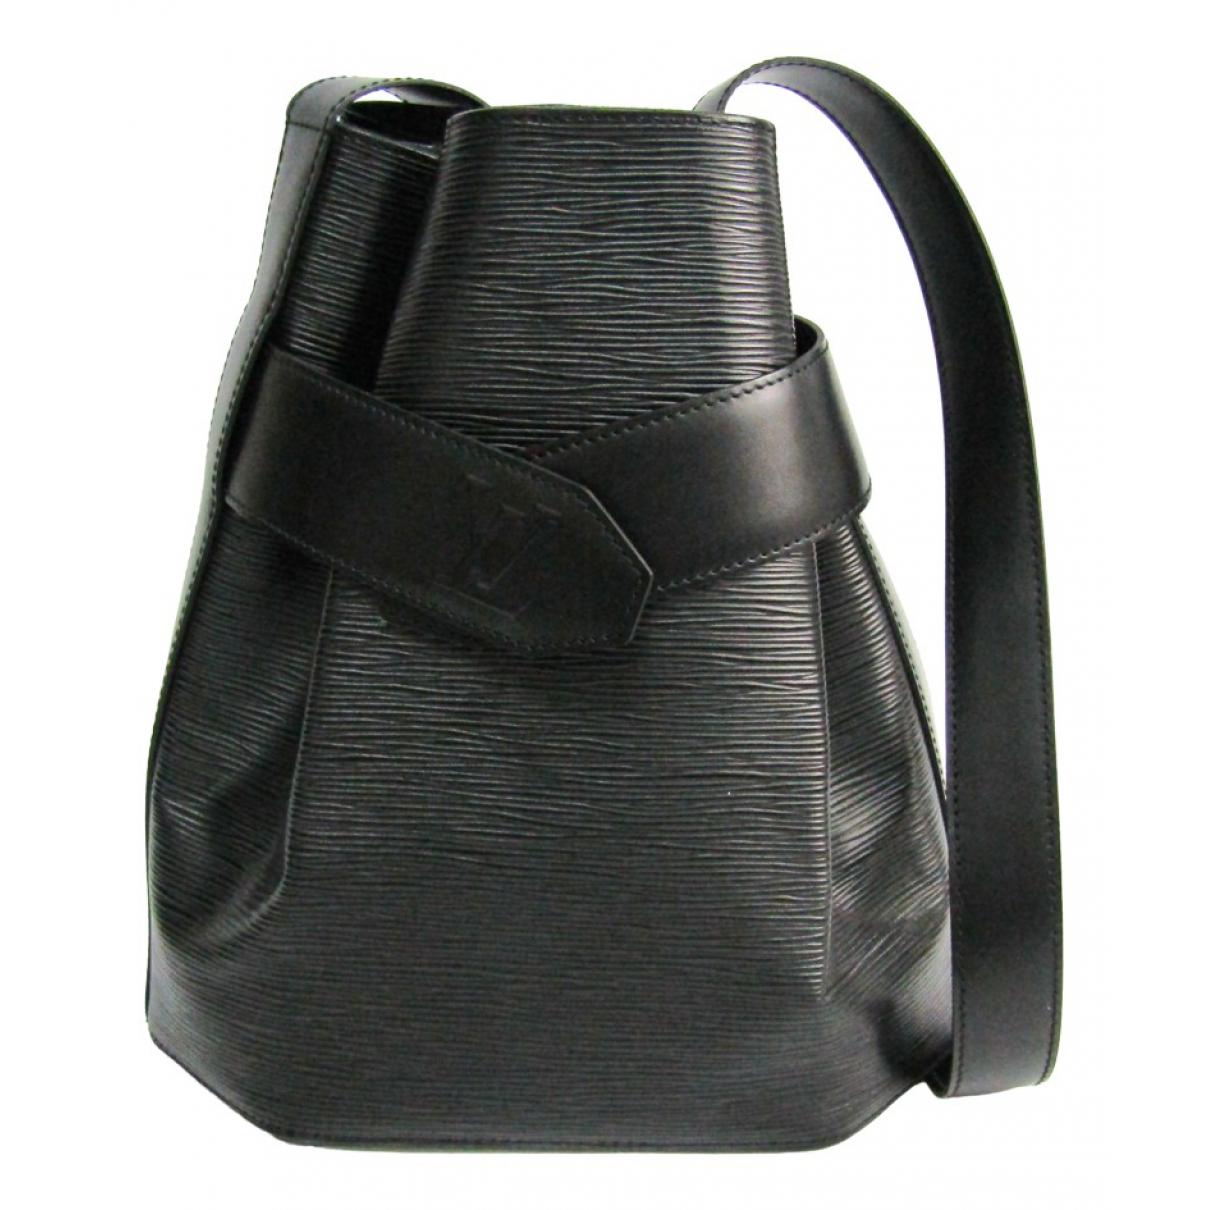 Bolso  Sac depaule de Cuero Louis Vuitton